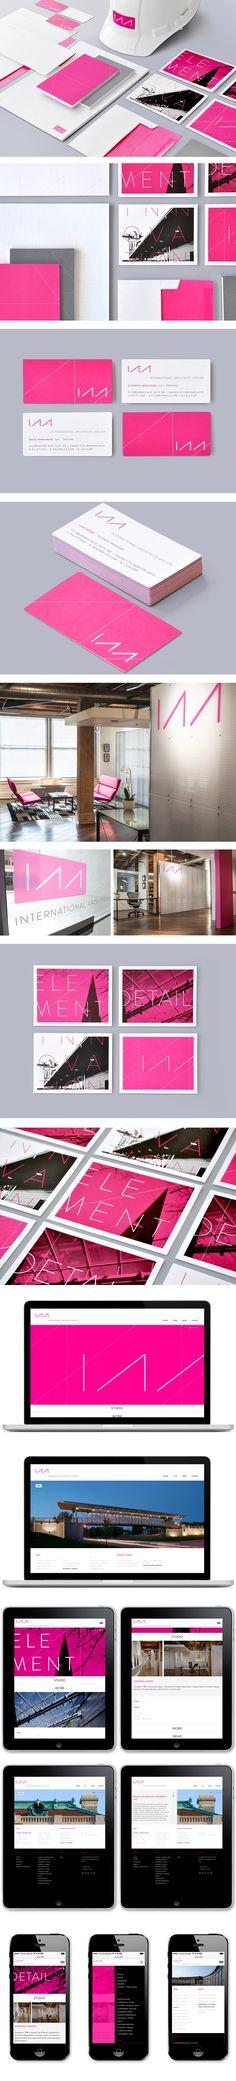 International Architects Atelier | Branding Business Collateral Copywriting Design Marketing Materials Website | Design Ranch